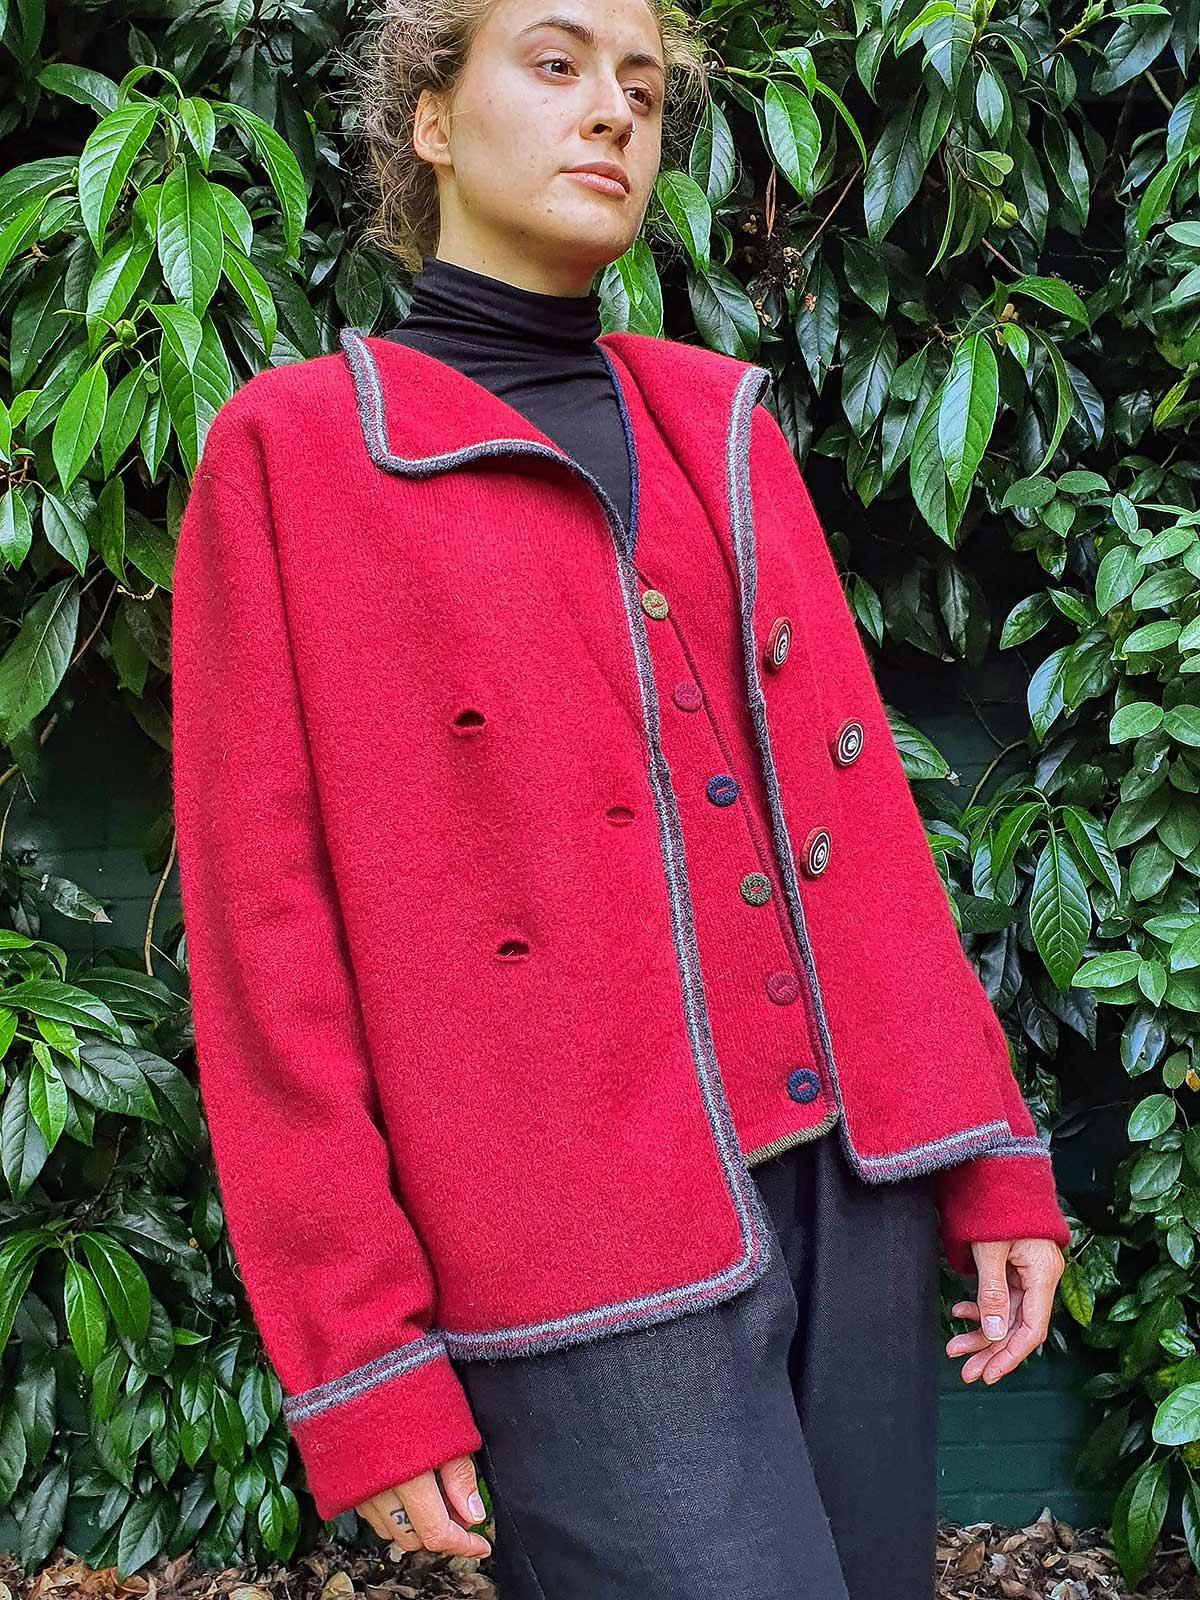 woman wearing jacket and matching waistcoat in garden